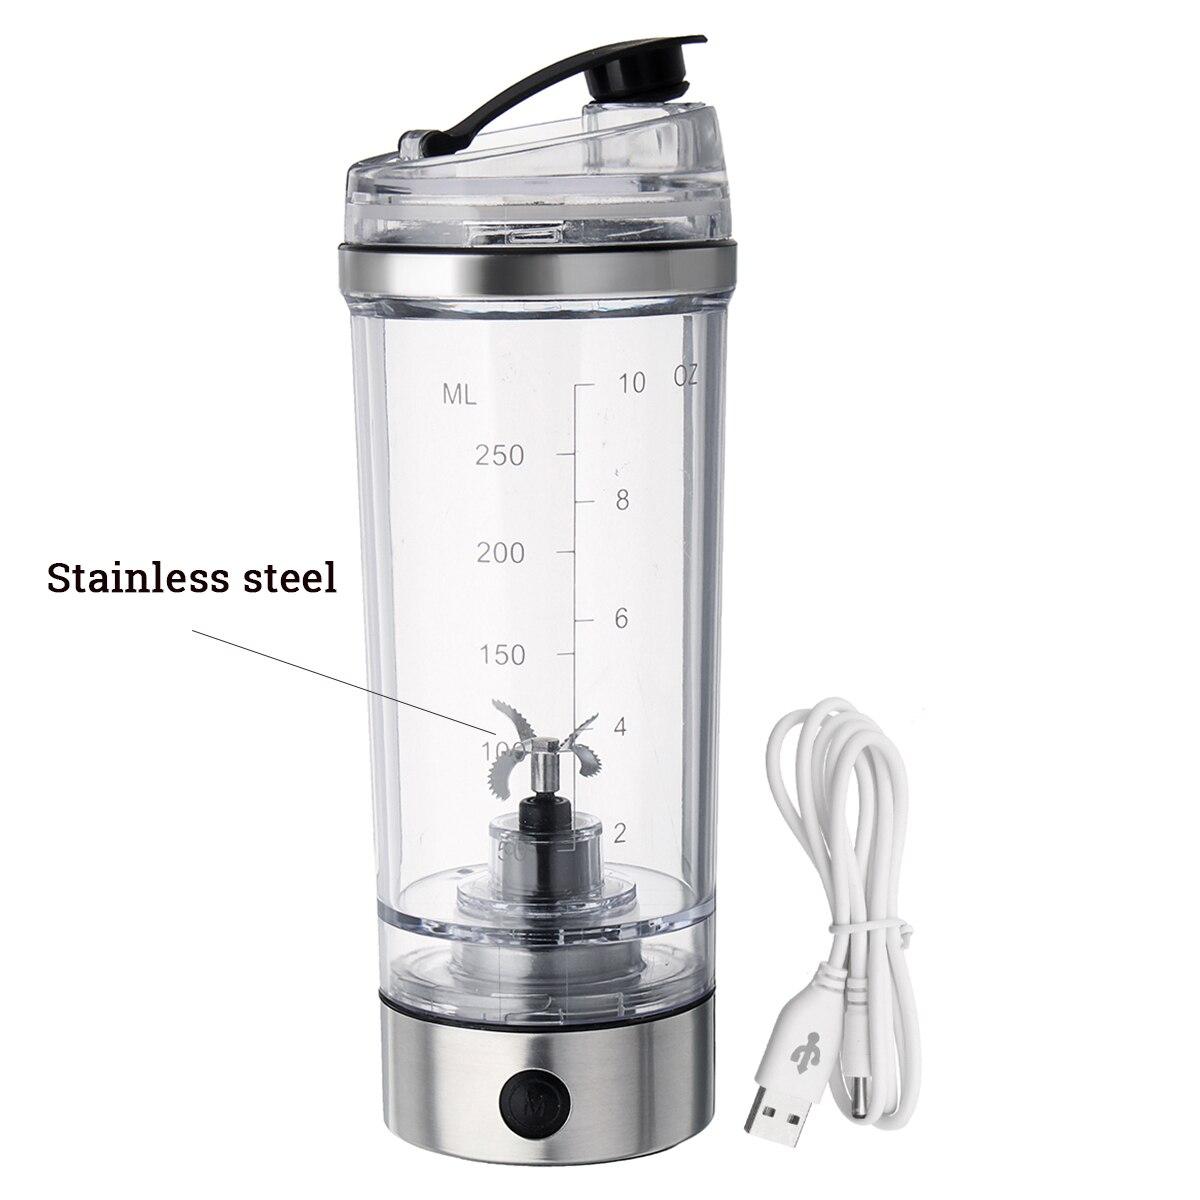 Hc048094527ea40238be04cb0c55530bdJ 2019 250ML Electric Protein Shake Stirrer USB Shake Bottle Milk Coffee Blender Kettle Fitness Vortex Tornado Smart Mixer